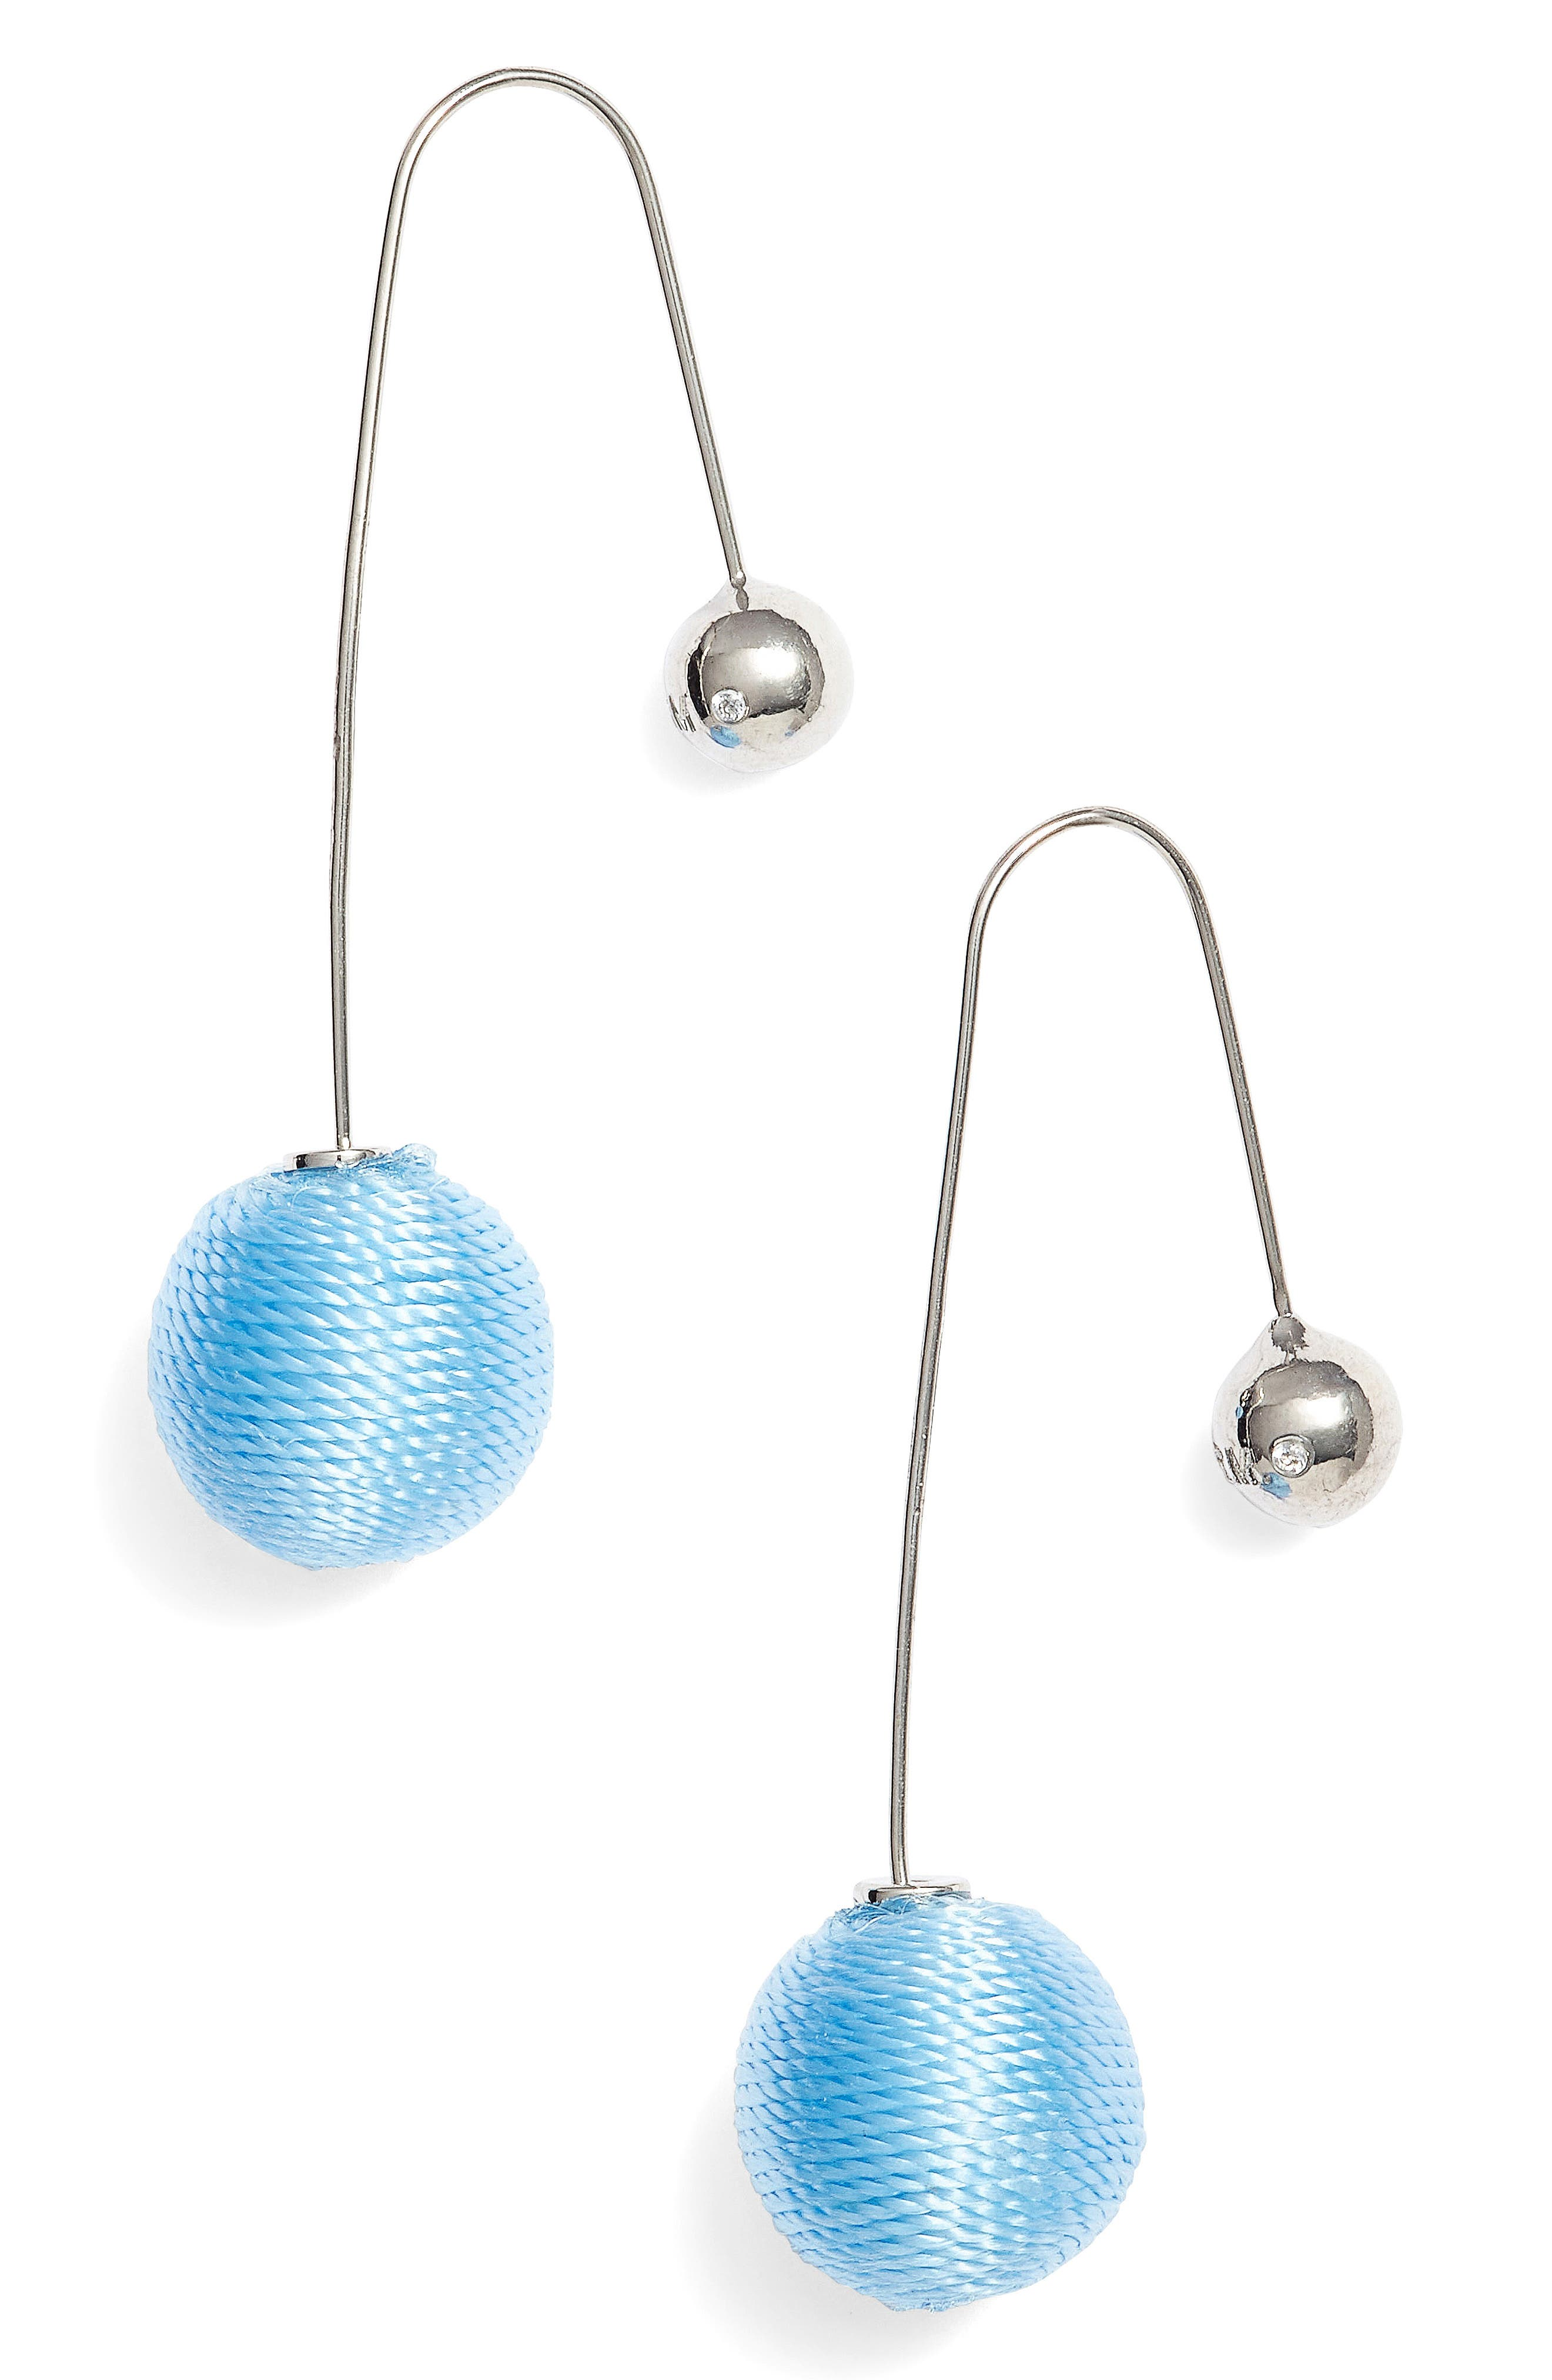 Contrast Sphere Threader Earrings,                             Main thumbnail 1, color,                             Blue/ Silver